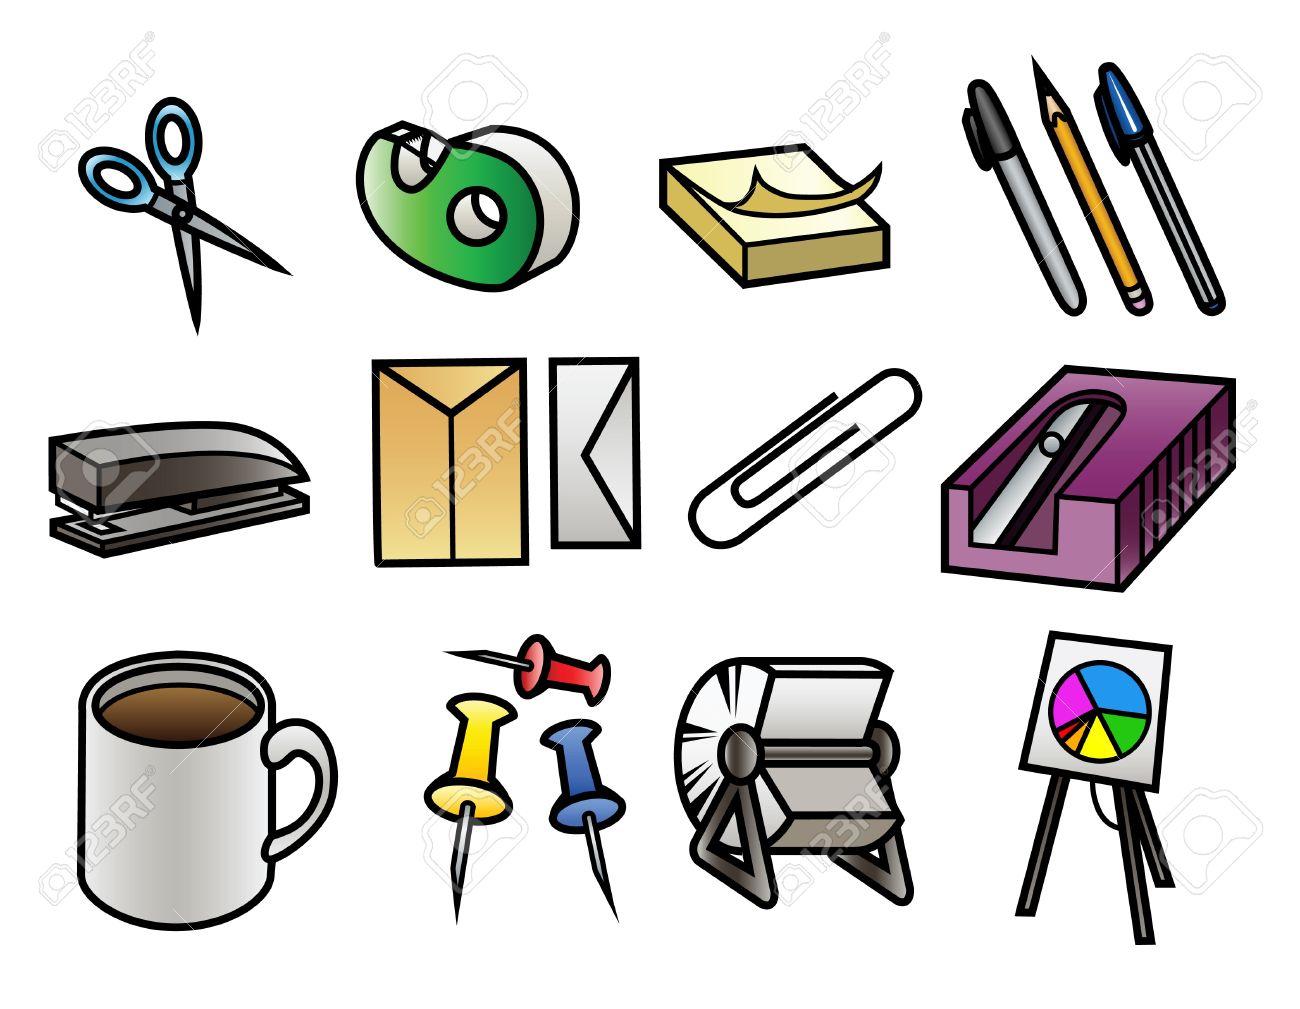 Bürobedarf clipart  12 Bunte Comic Bürobedarf Symbole Lizenzfrei Nutzbare ...